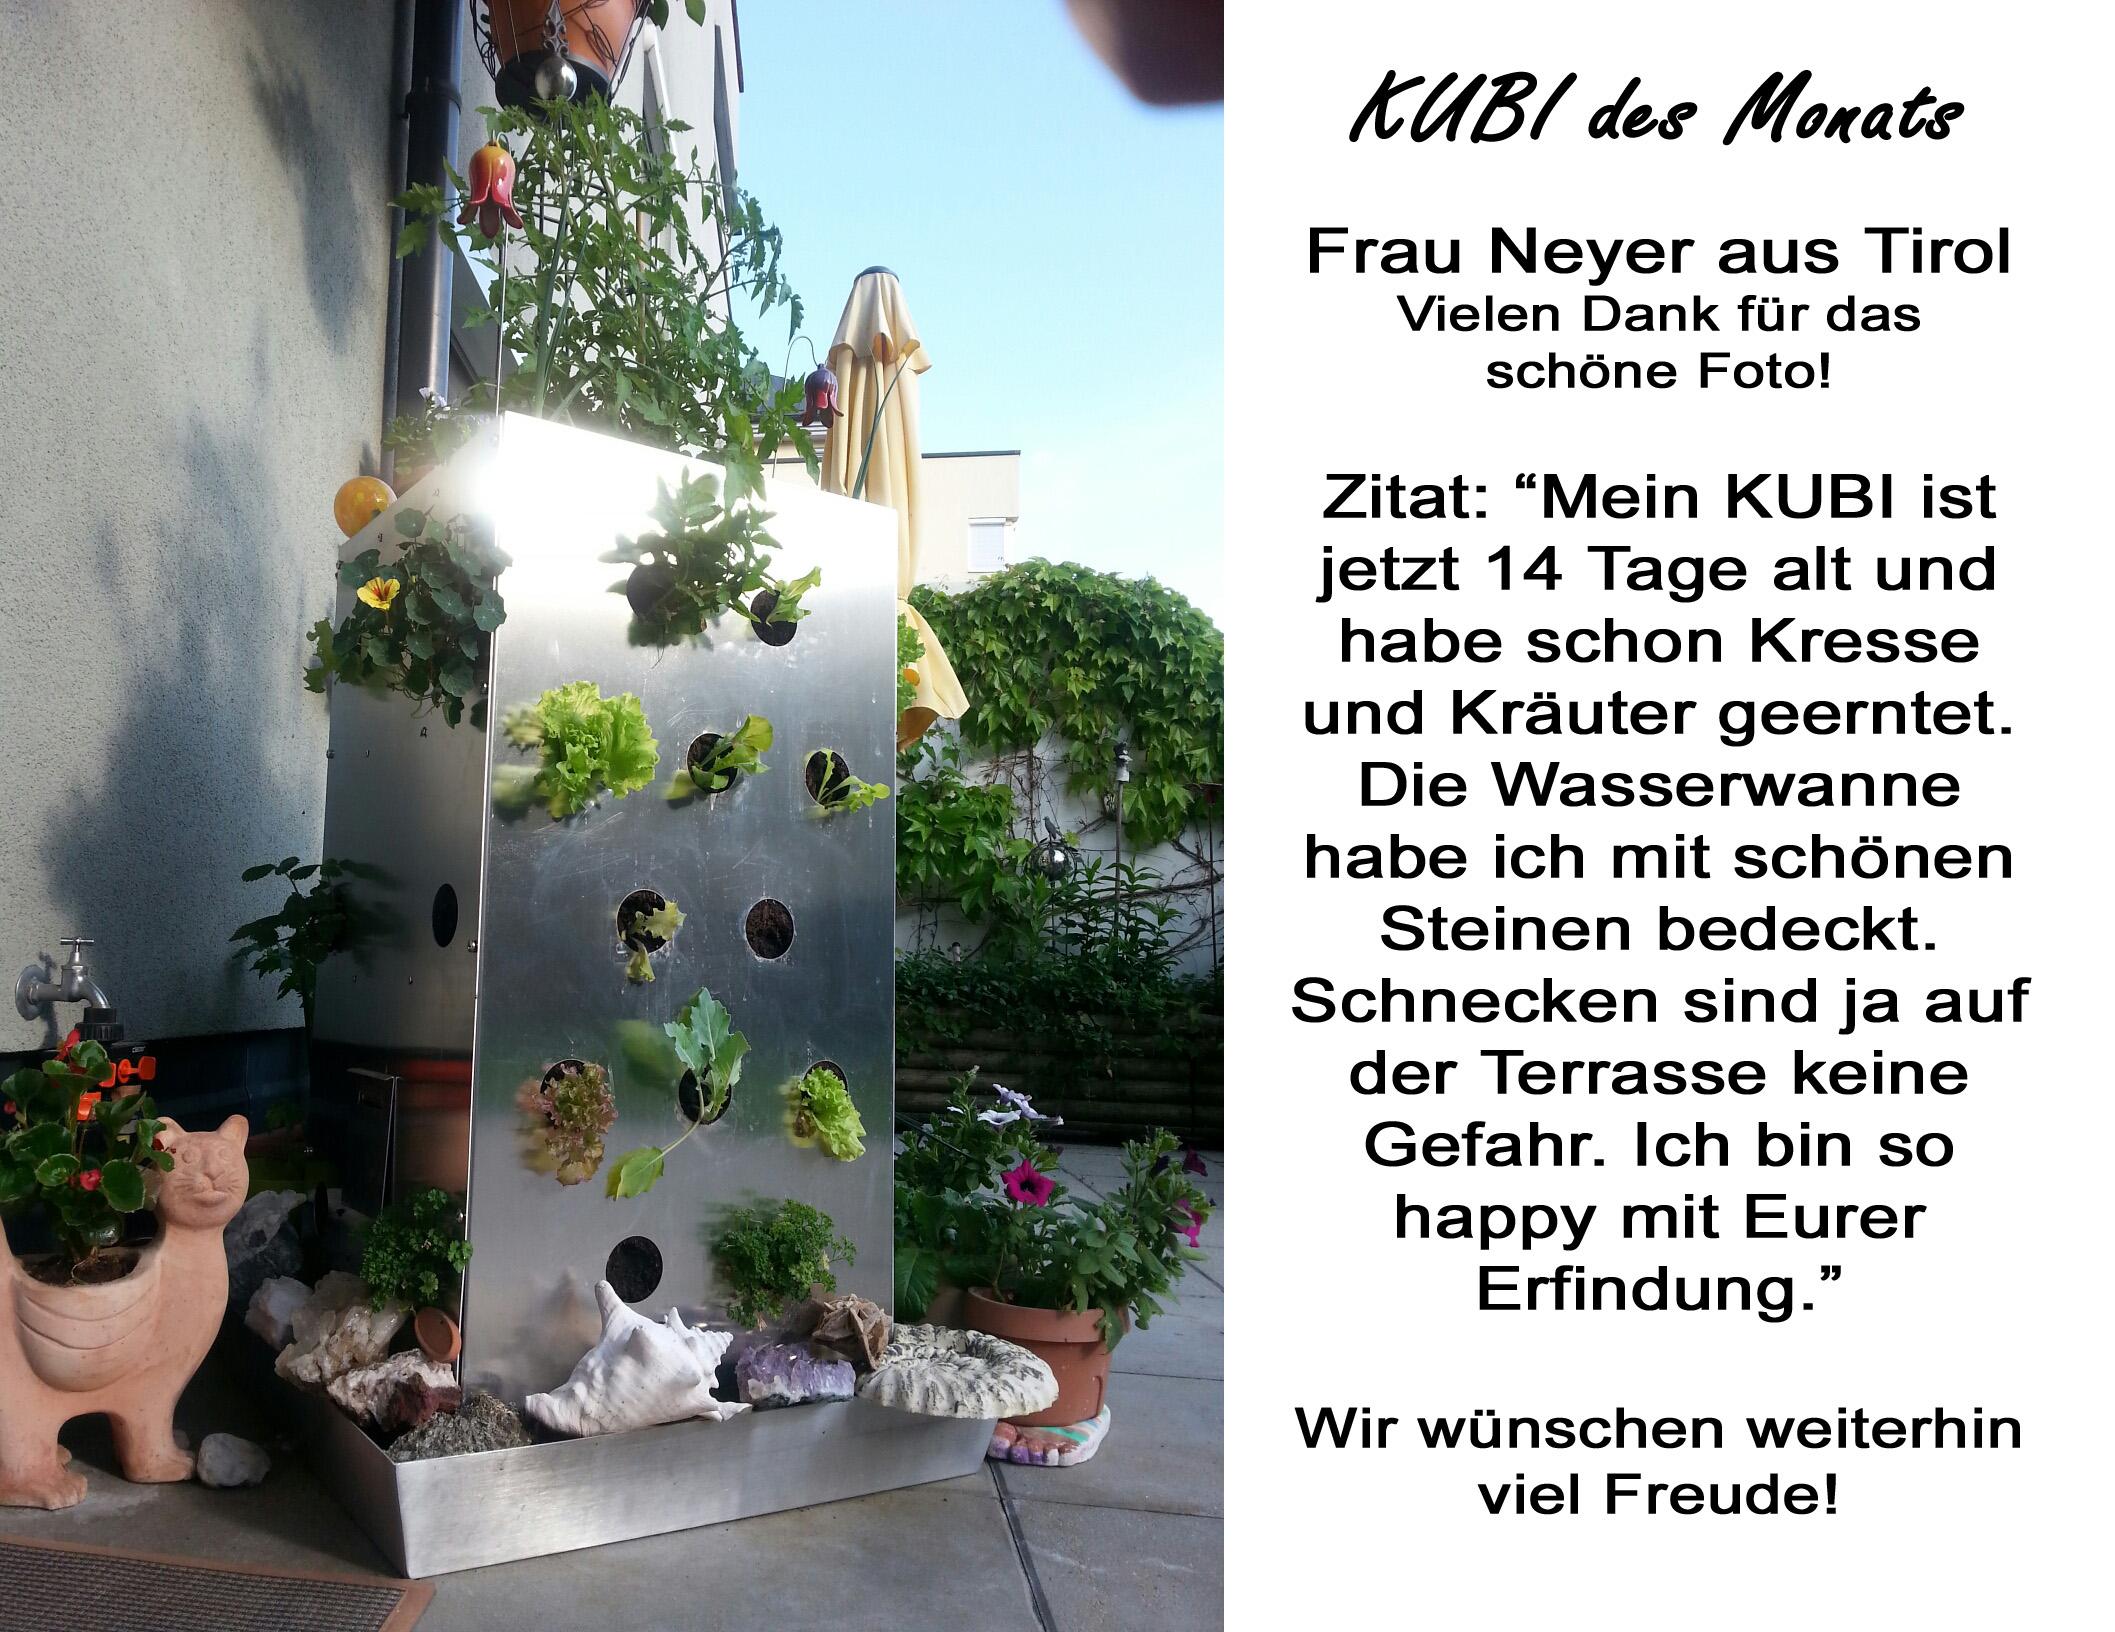 2015-12 KUBI des Monats Neyer Tirol